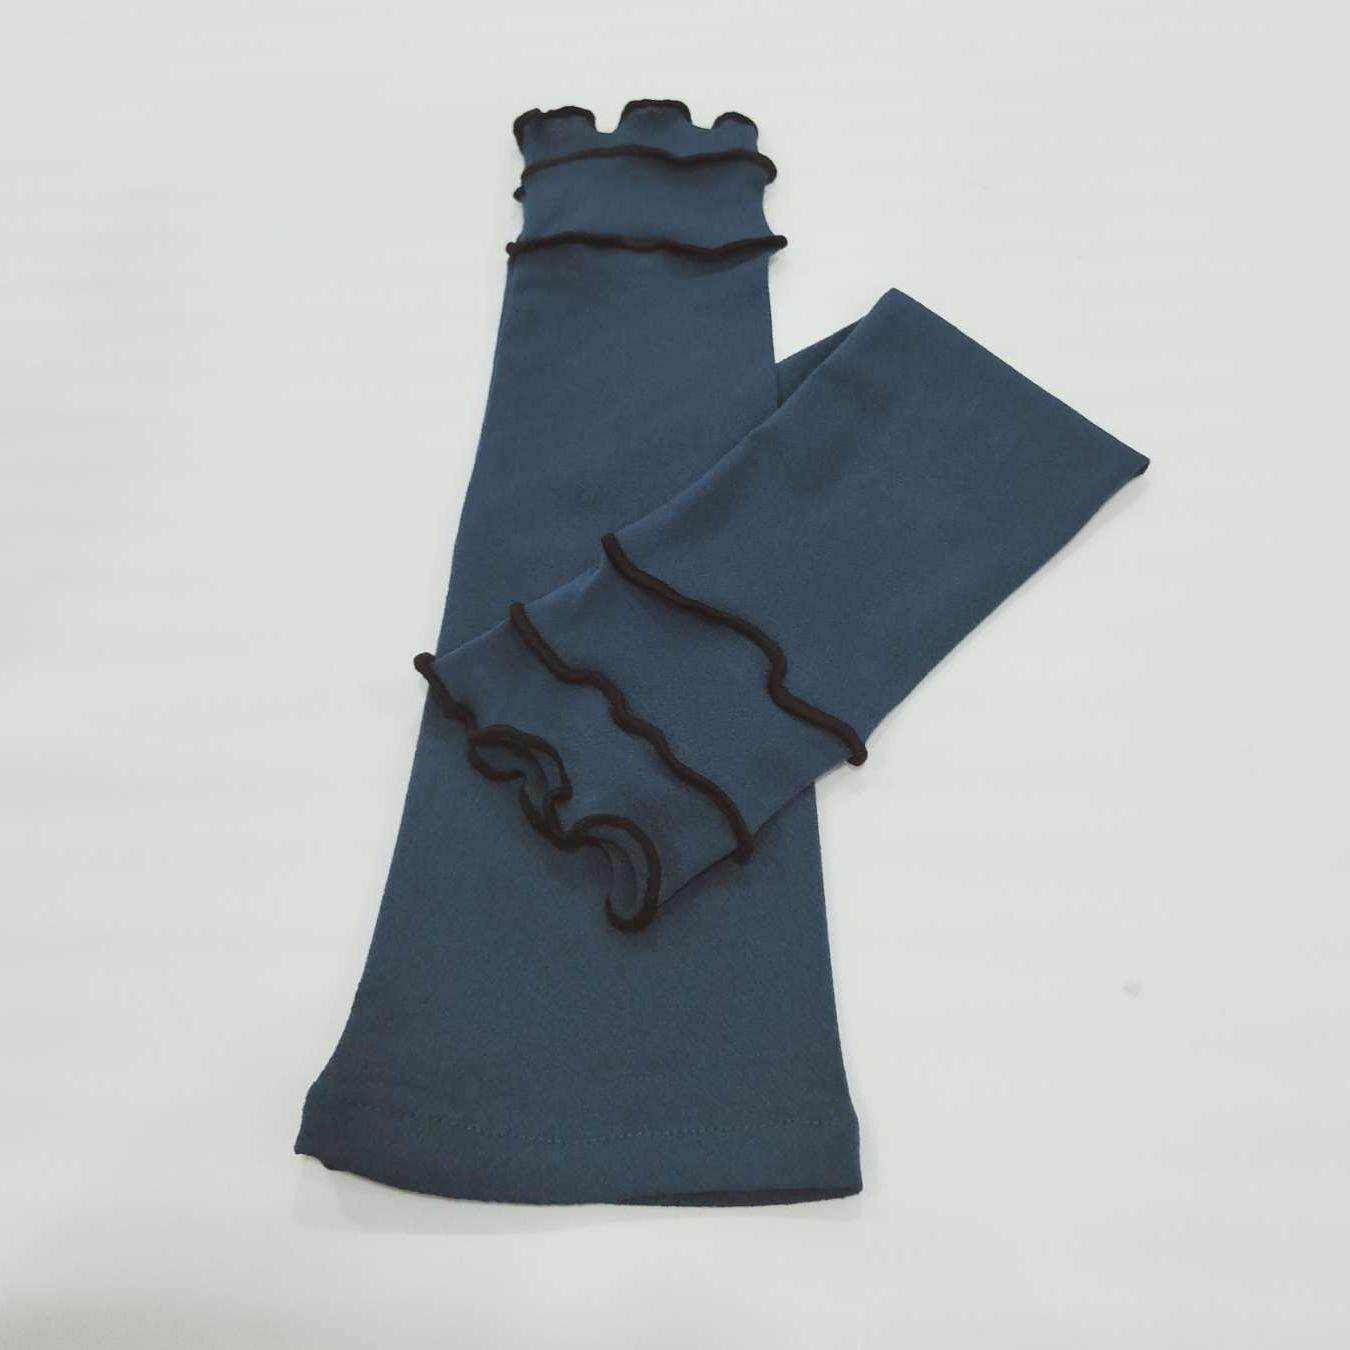 Hand / Arm Socks Ruffle 3layer By Sitikhaleedaa.